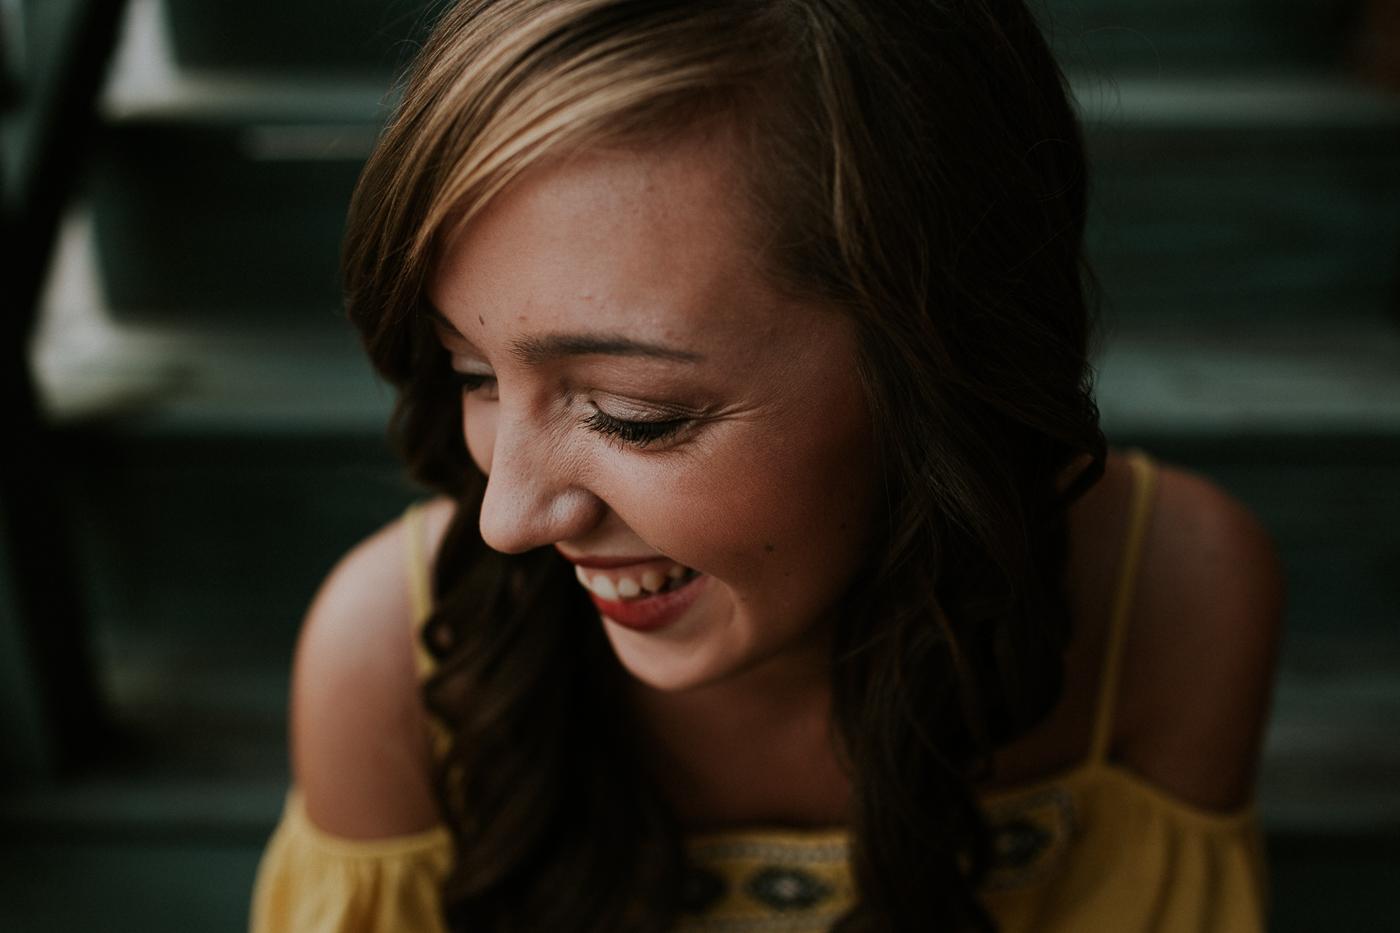 2017 high school senior portrait by Grace E. Jones Photography